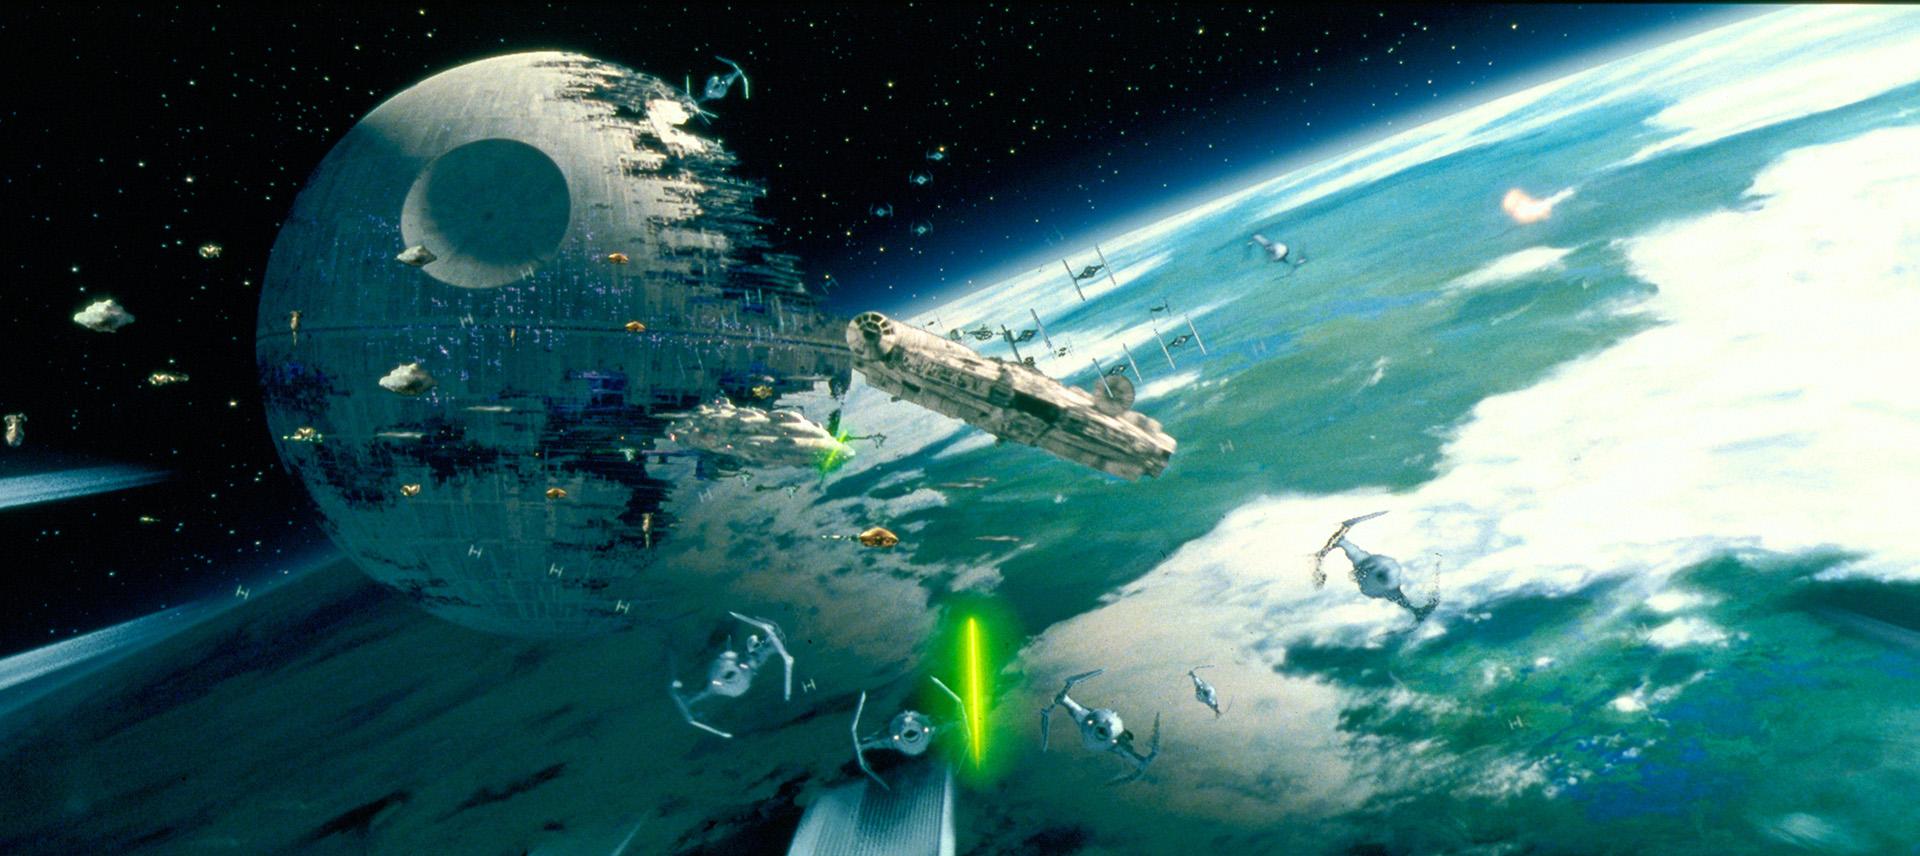 Star Wars Episode 6: Return of the Jedi | Lucasfilm.com